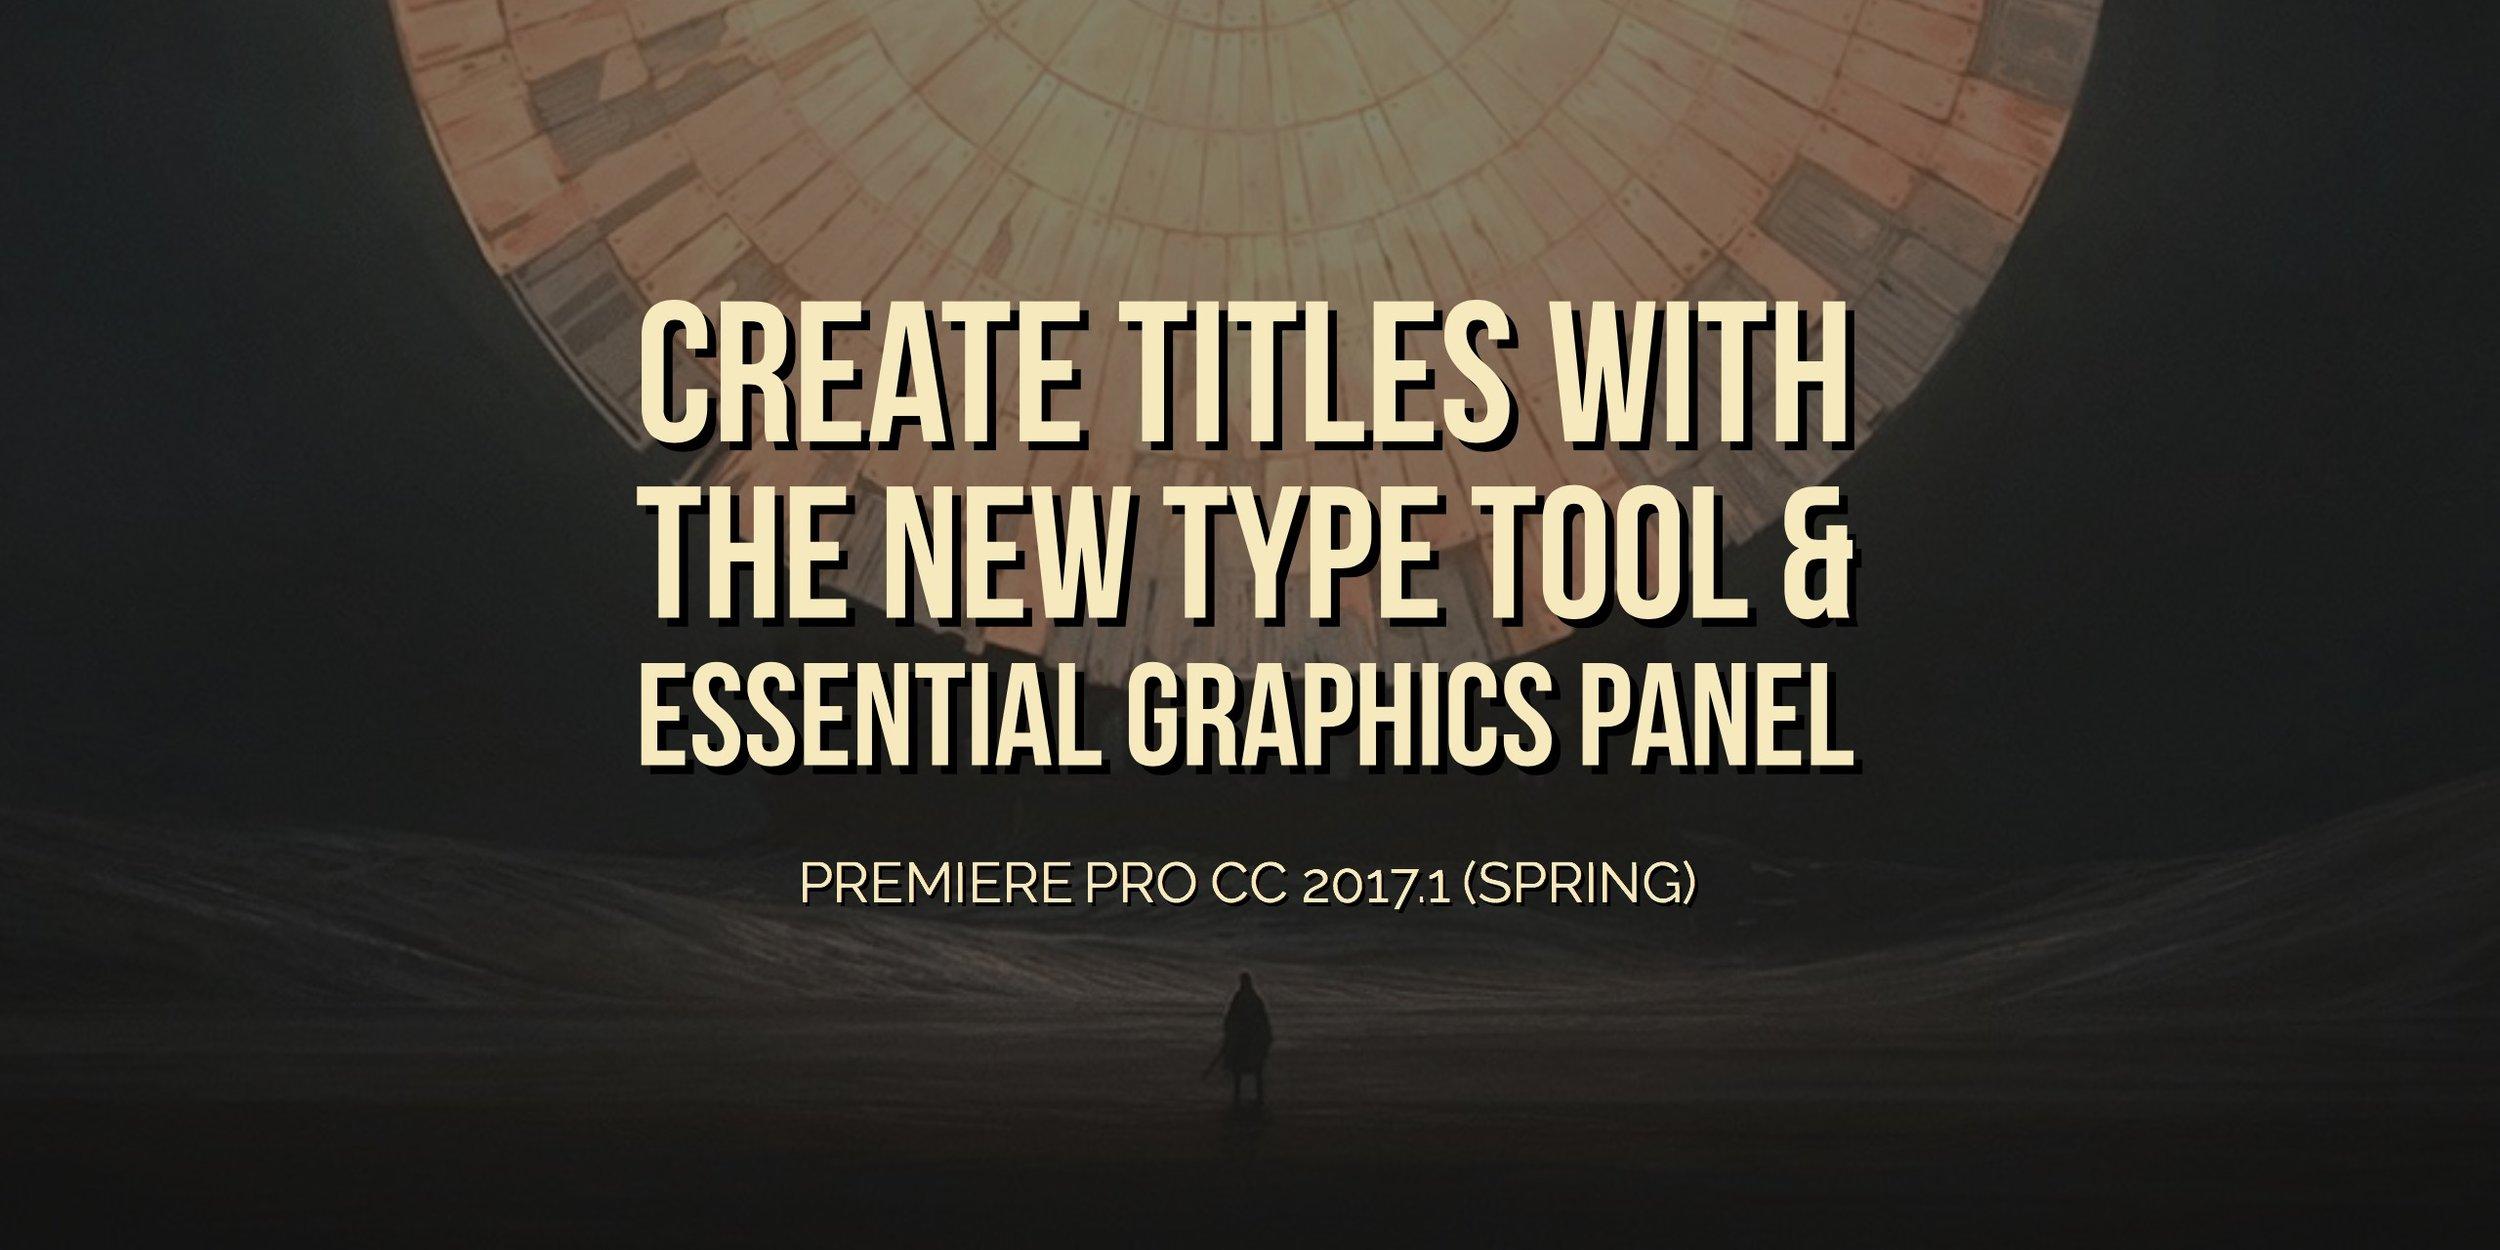 create-titles-type-tool-essential-graphics-panel-premiere-pro.jpeg